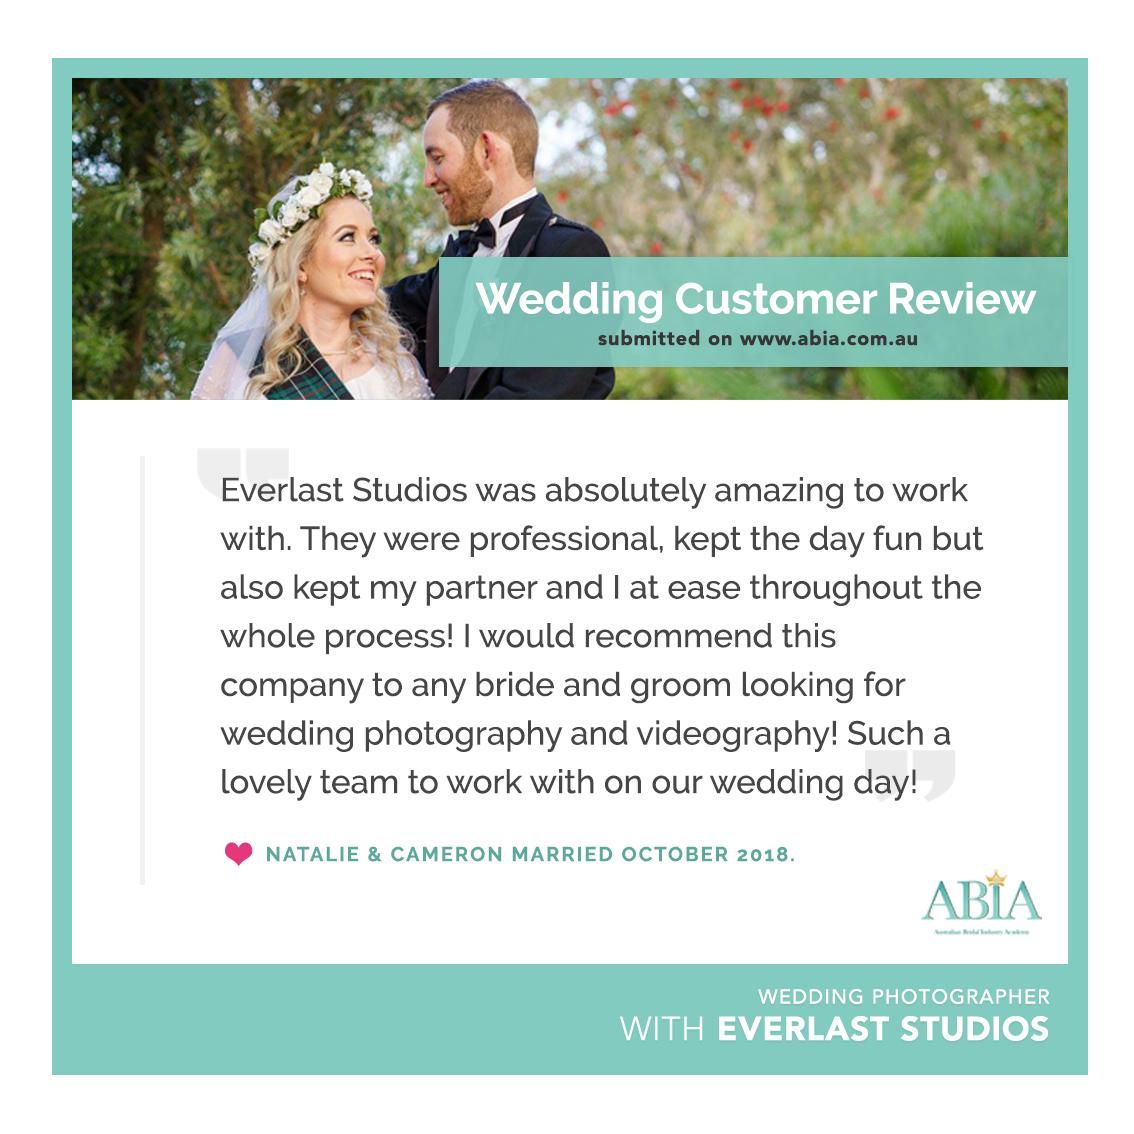 Everlast Studios - ABIA Review - Natalie & Cameron